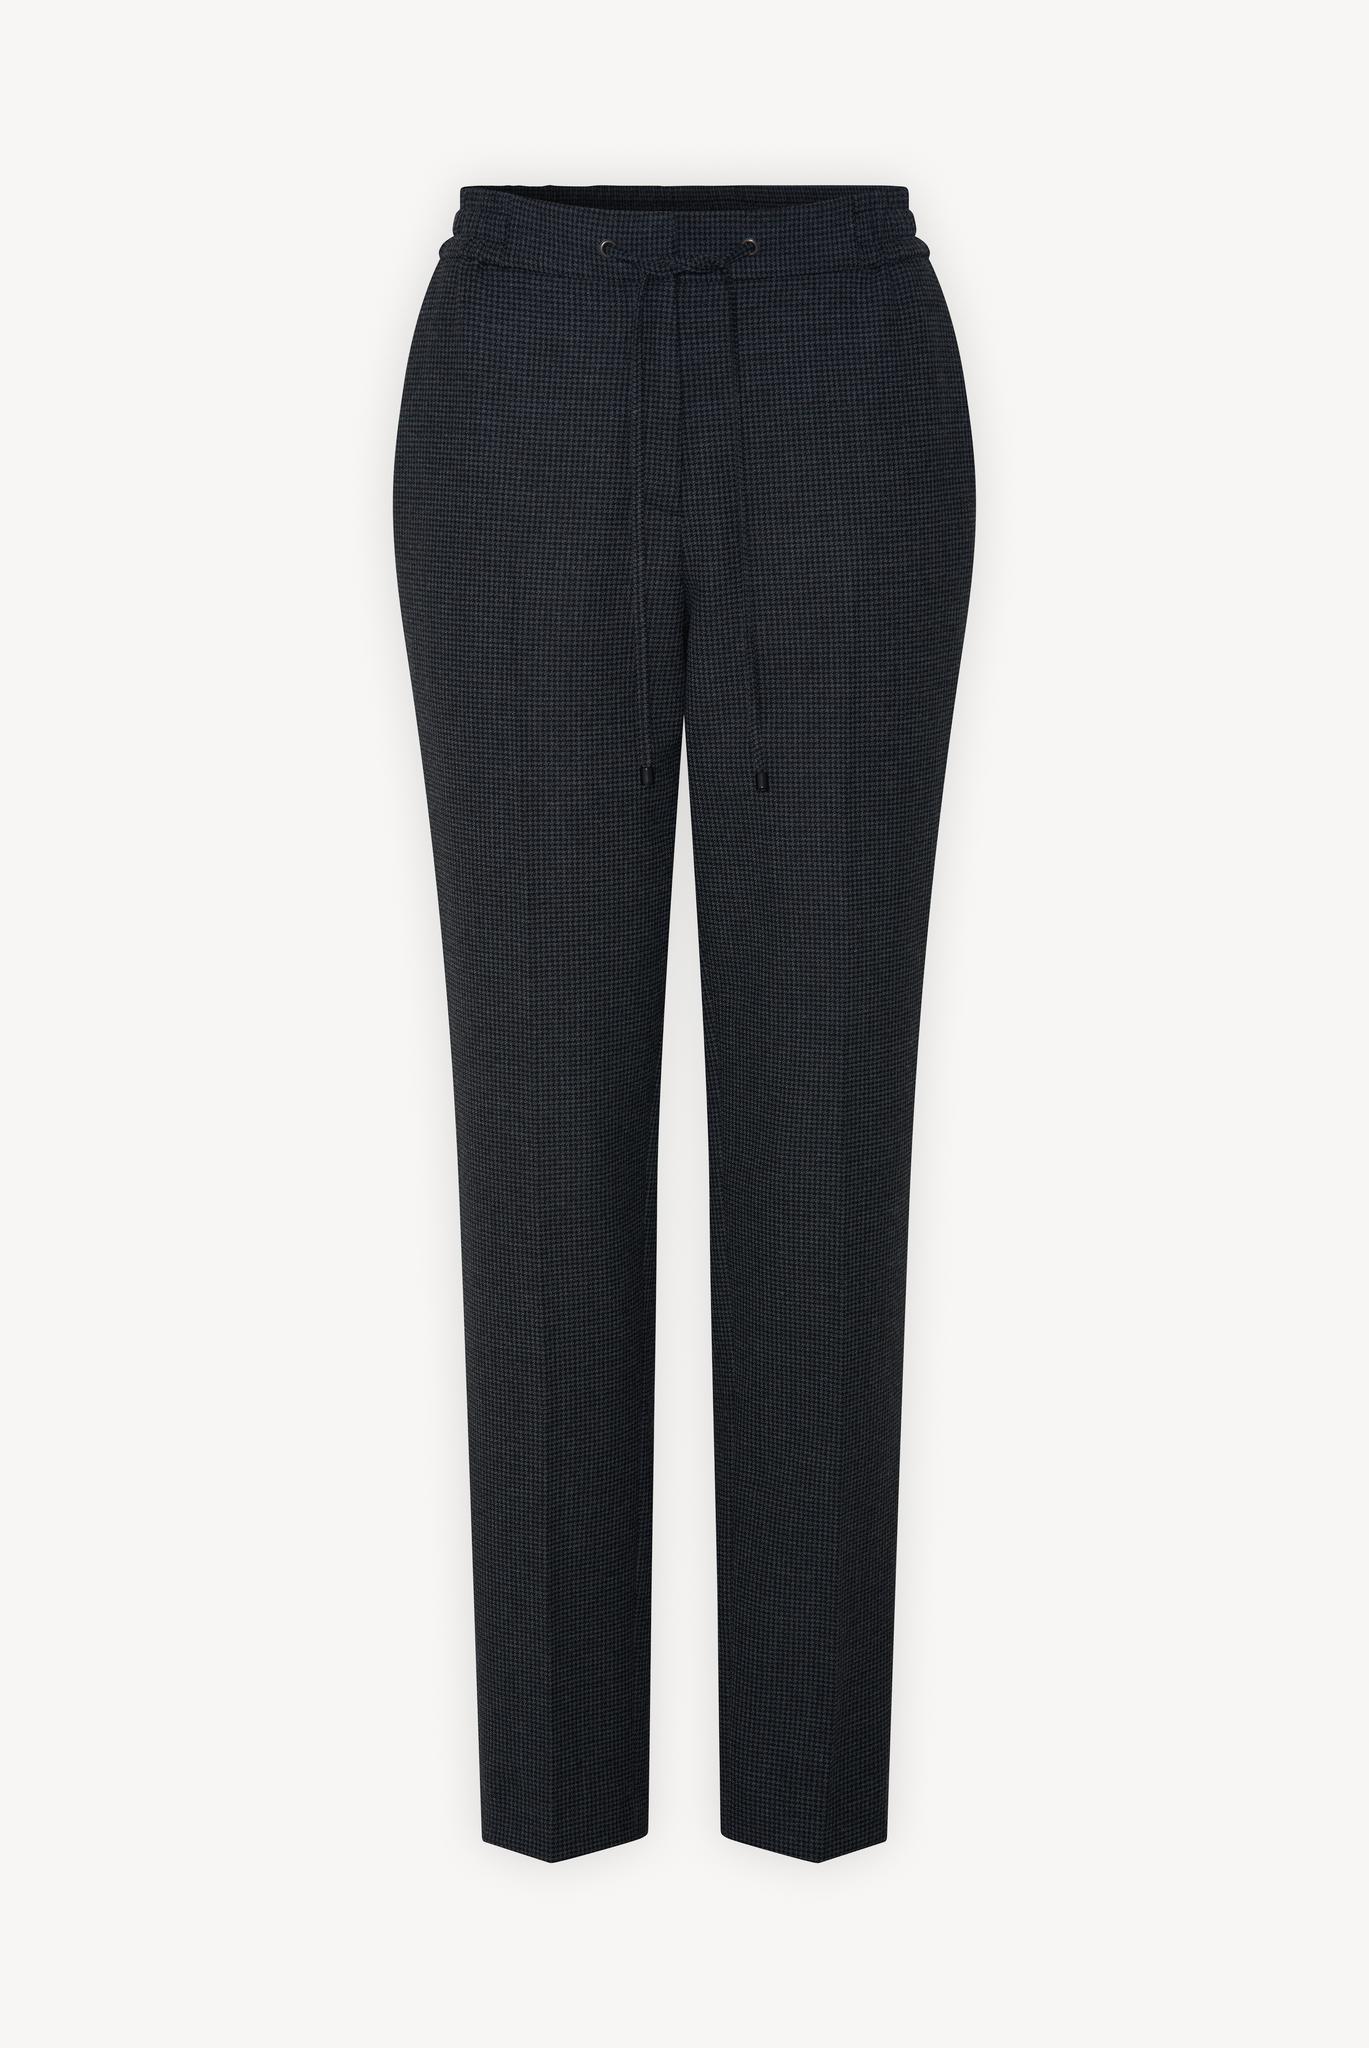 Классические брюки на завязках